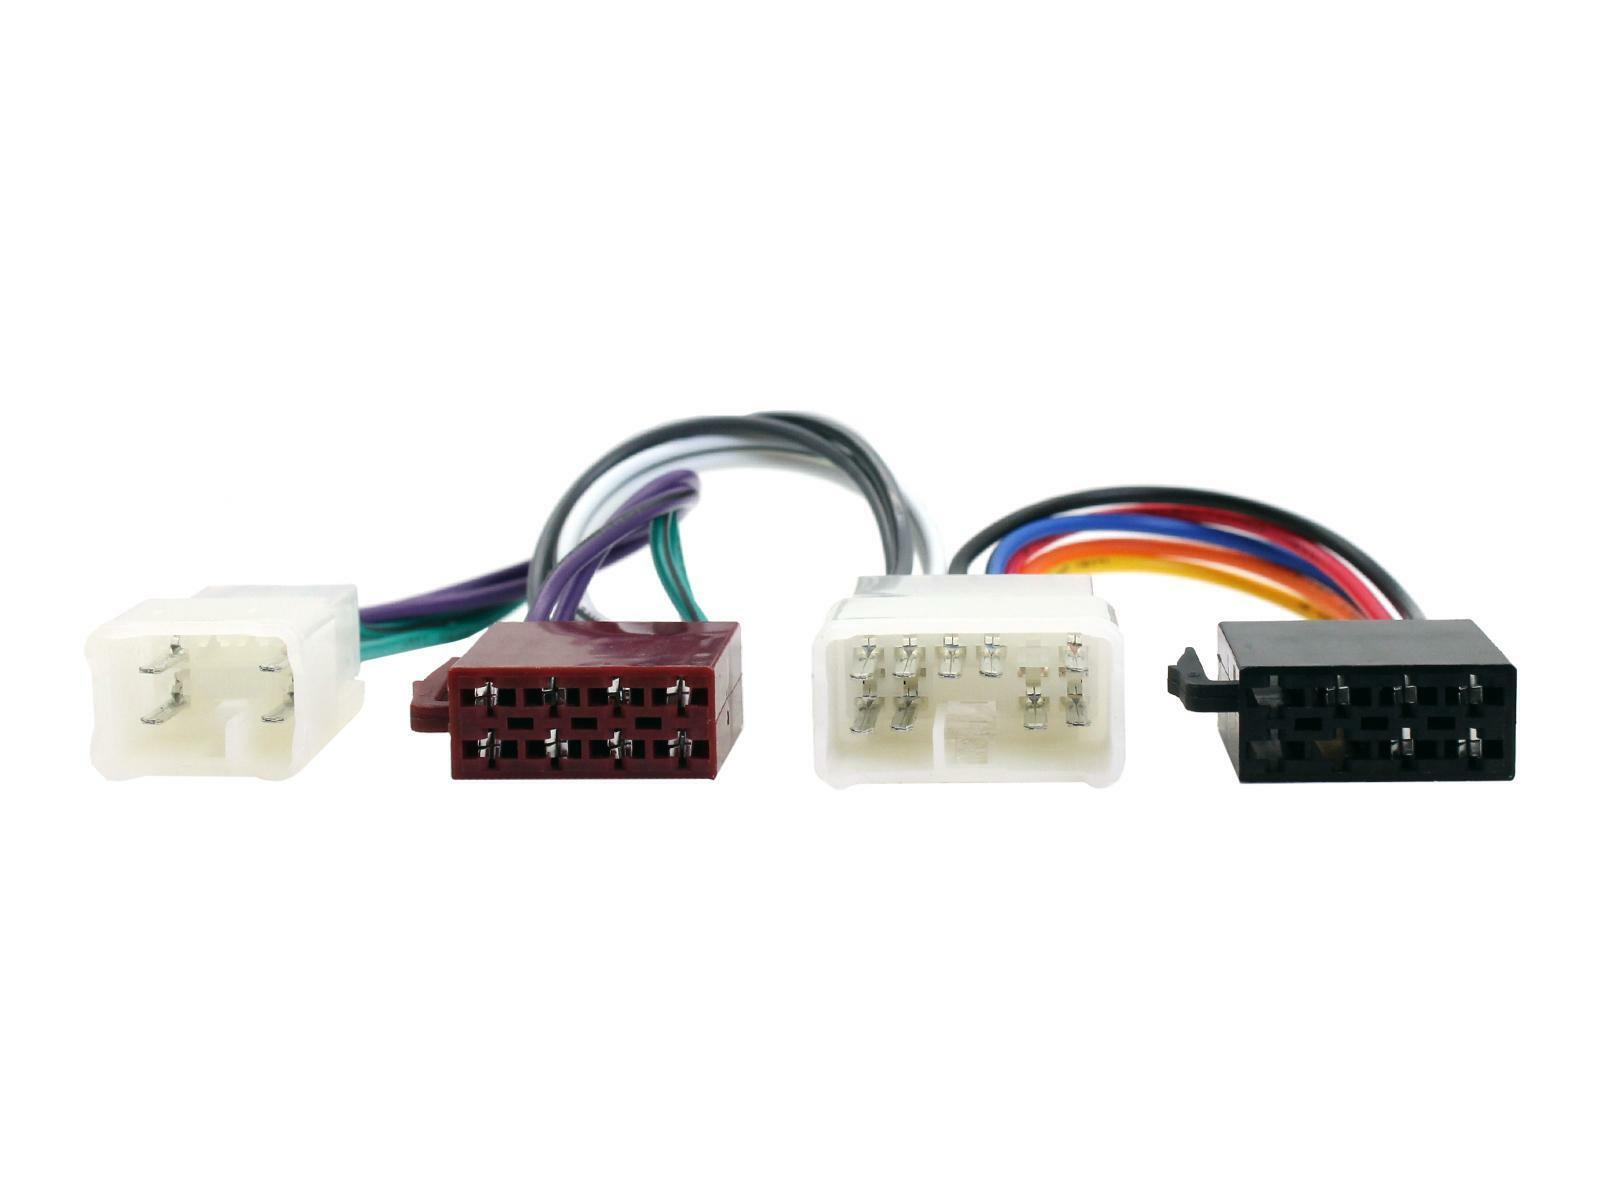 Lexus Sc400/sc300 CD Radio Stereo Headunit ISO Wiring Harness Adaptor  Ct20ty01 for sale online | eBayeBay